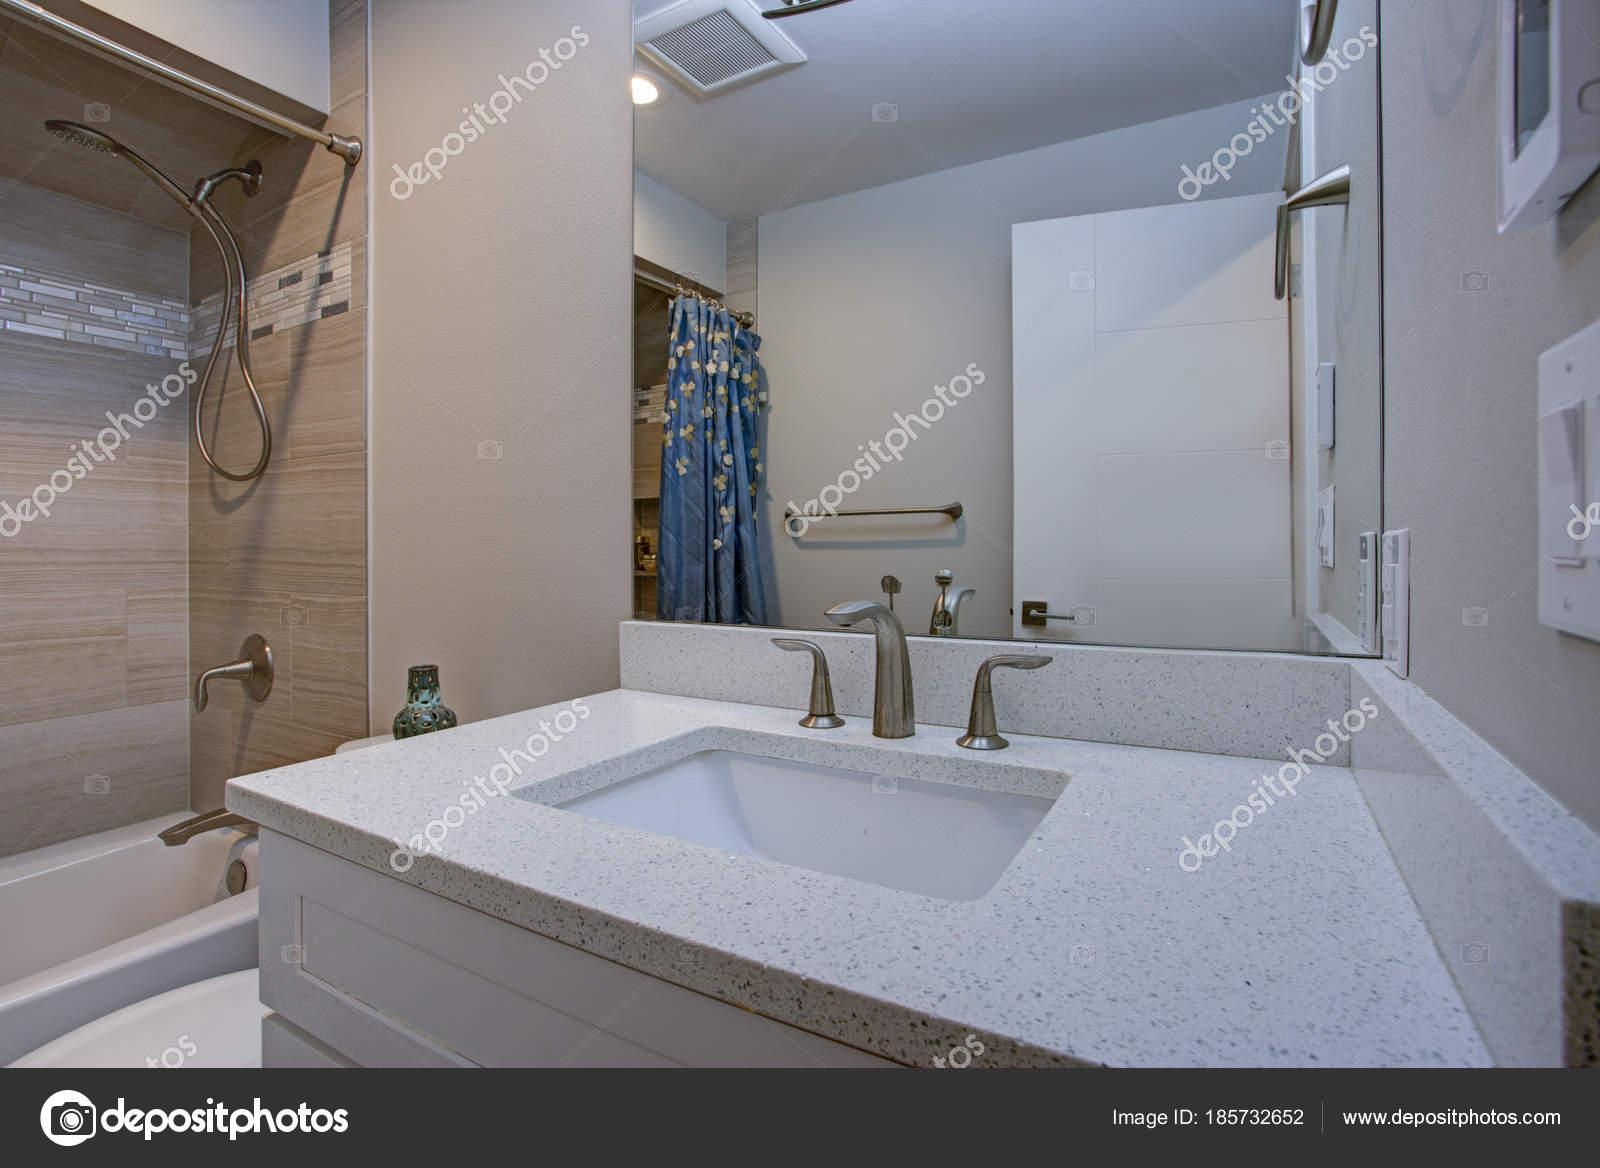 Fußboden Fliesen Marmor ~ Iran tundra grey marmor fliesen grau farbe marmor bodenfliesen